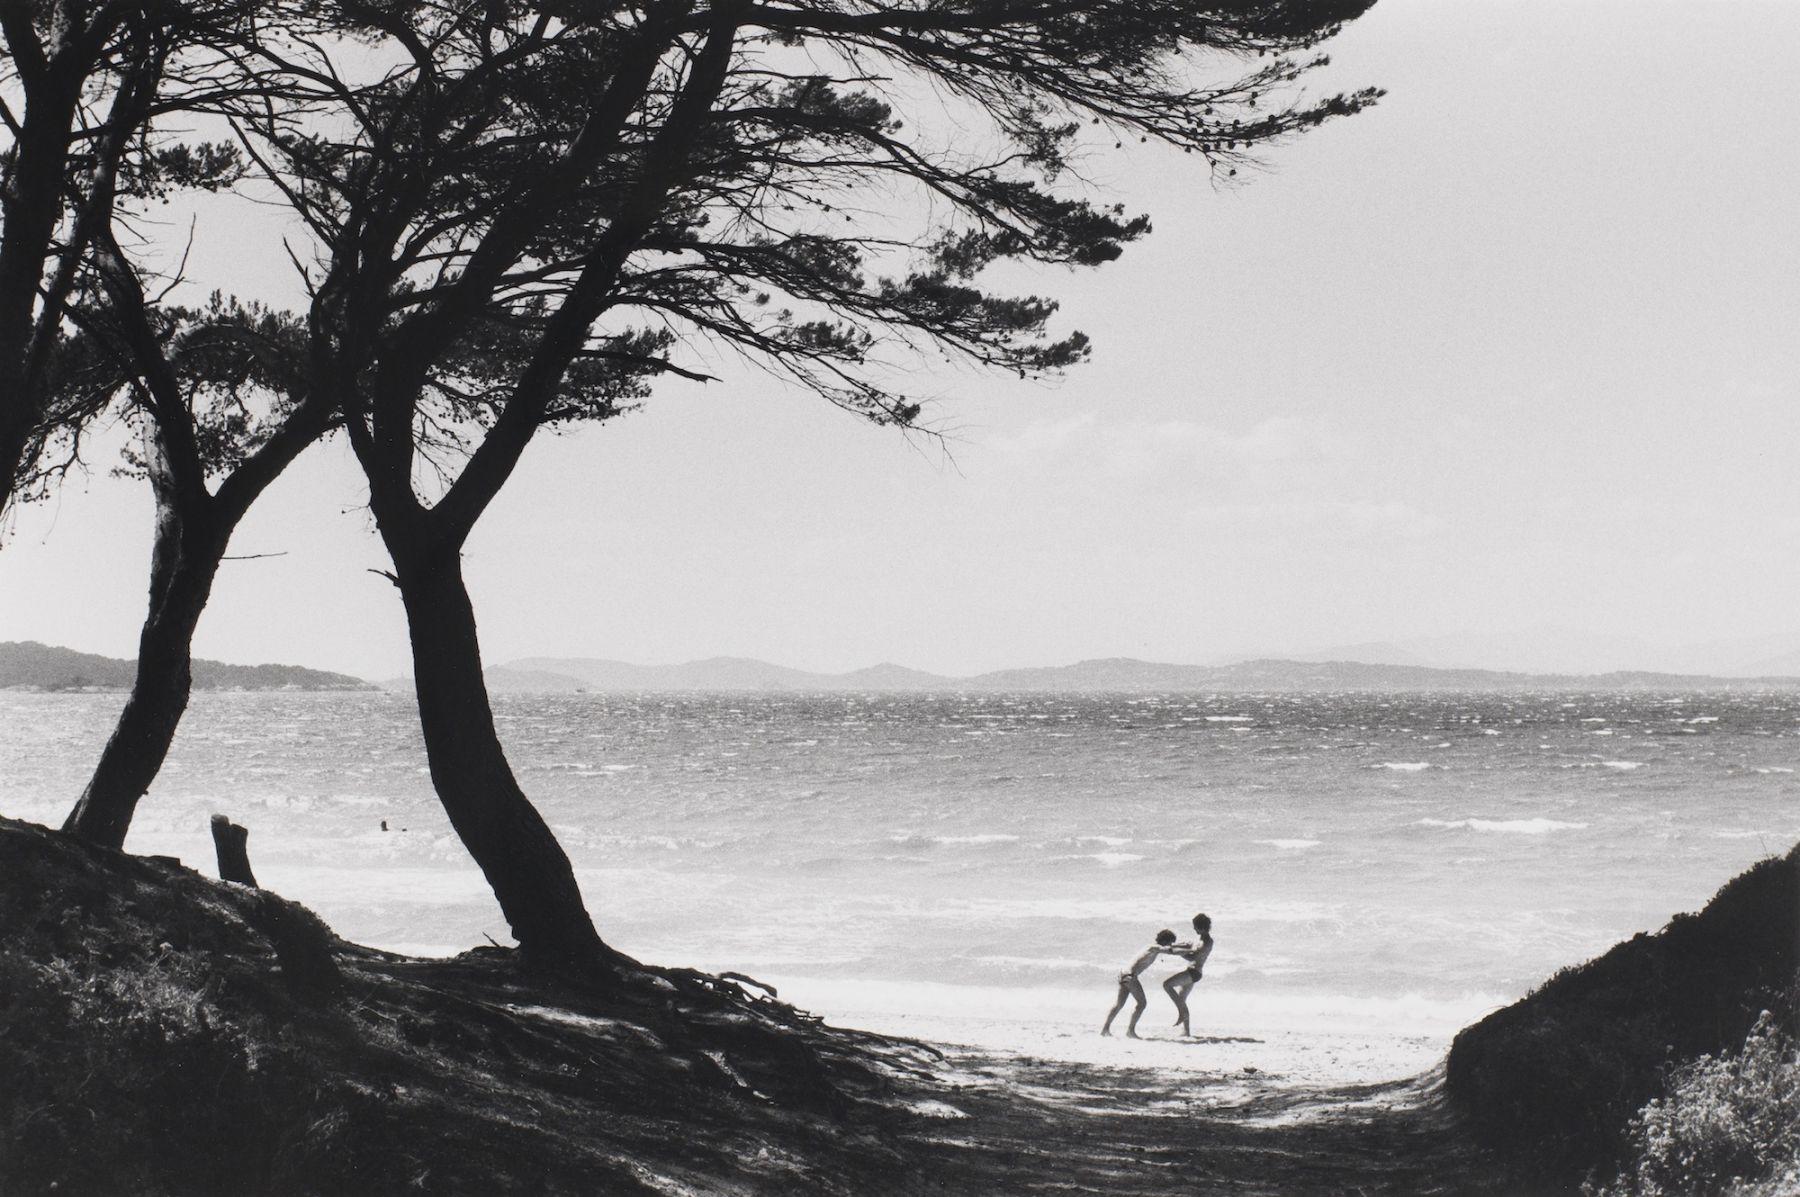 Bernard Plossu (1945-)  Untitled (Playing on beach, two trees), n.d.  Gelatin silver print  12 x 16 inches (paper), black and white photography black and white photography